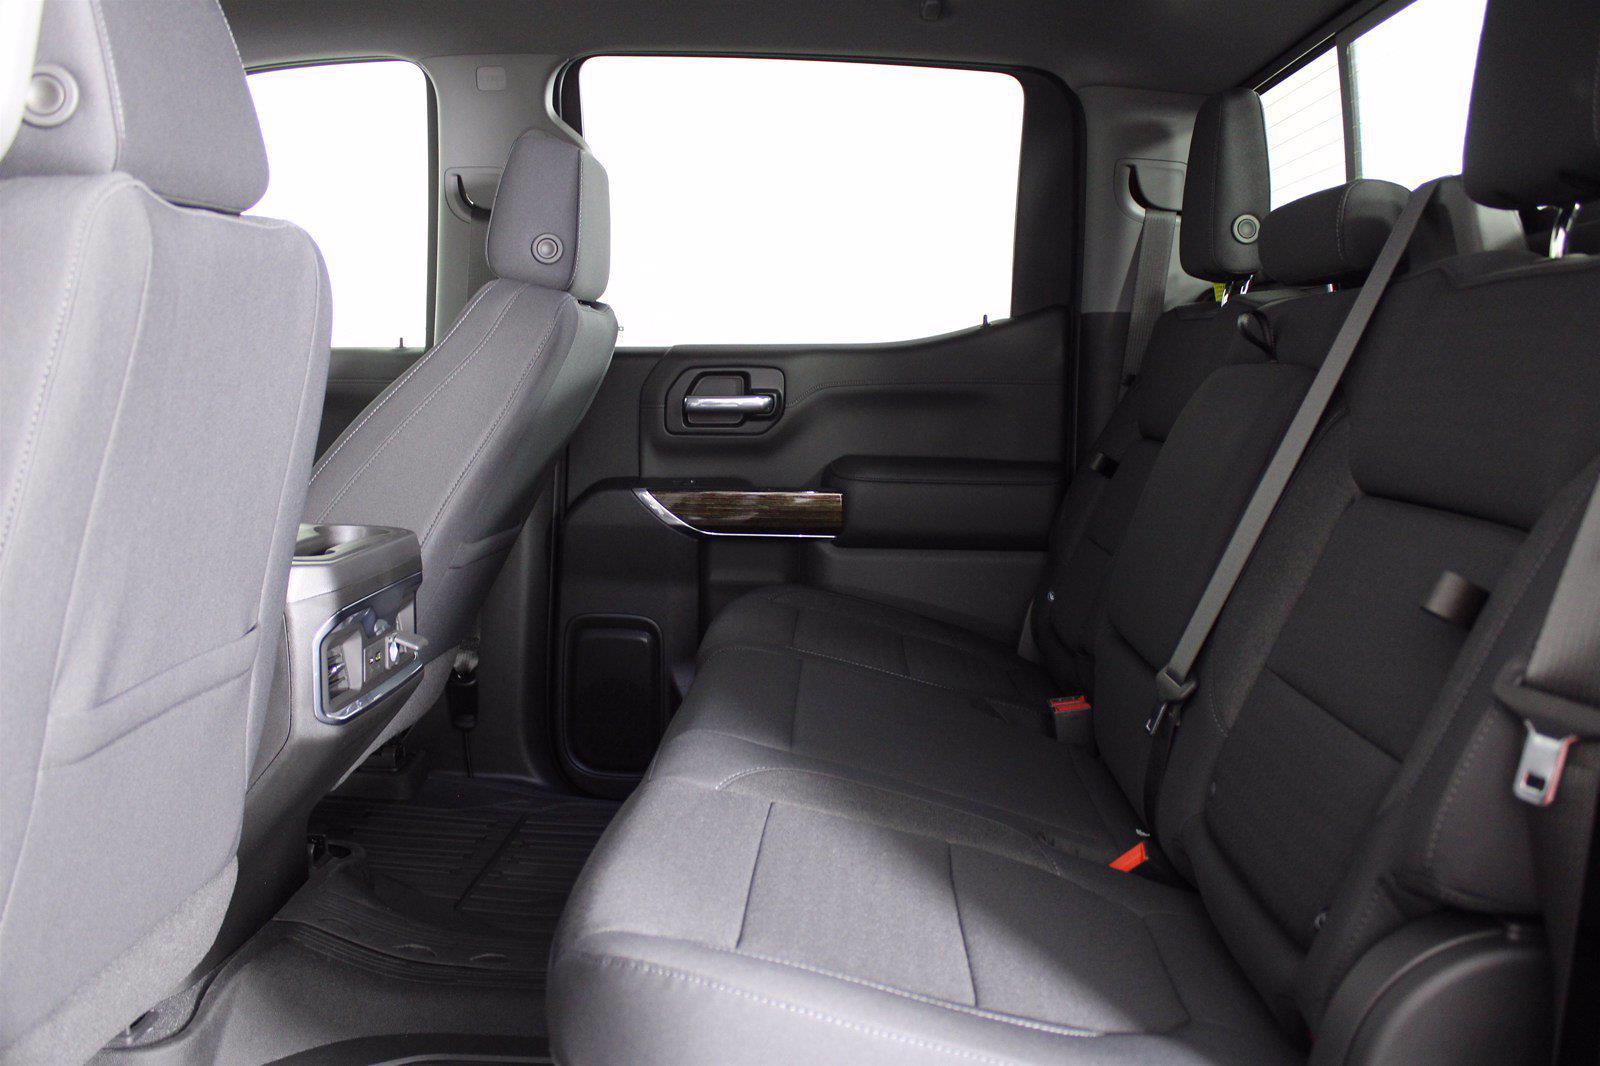 2021 GMC Sierra 1500 Crew Cab 4x4, Pickup #D411004 - photo 16